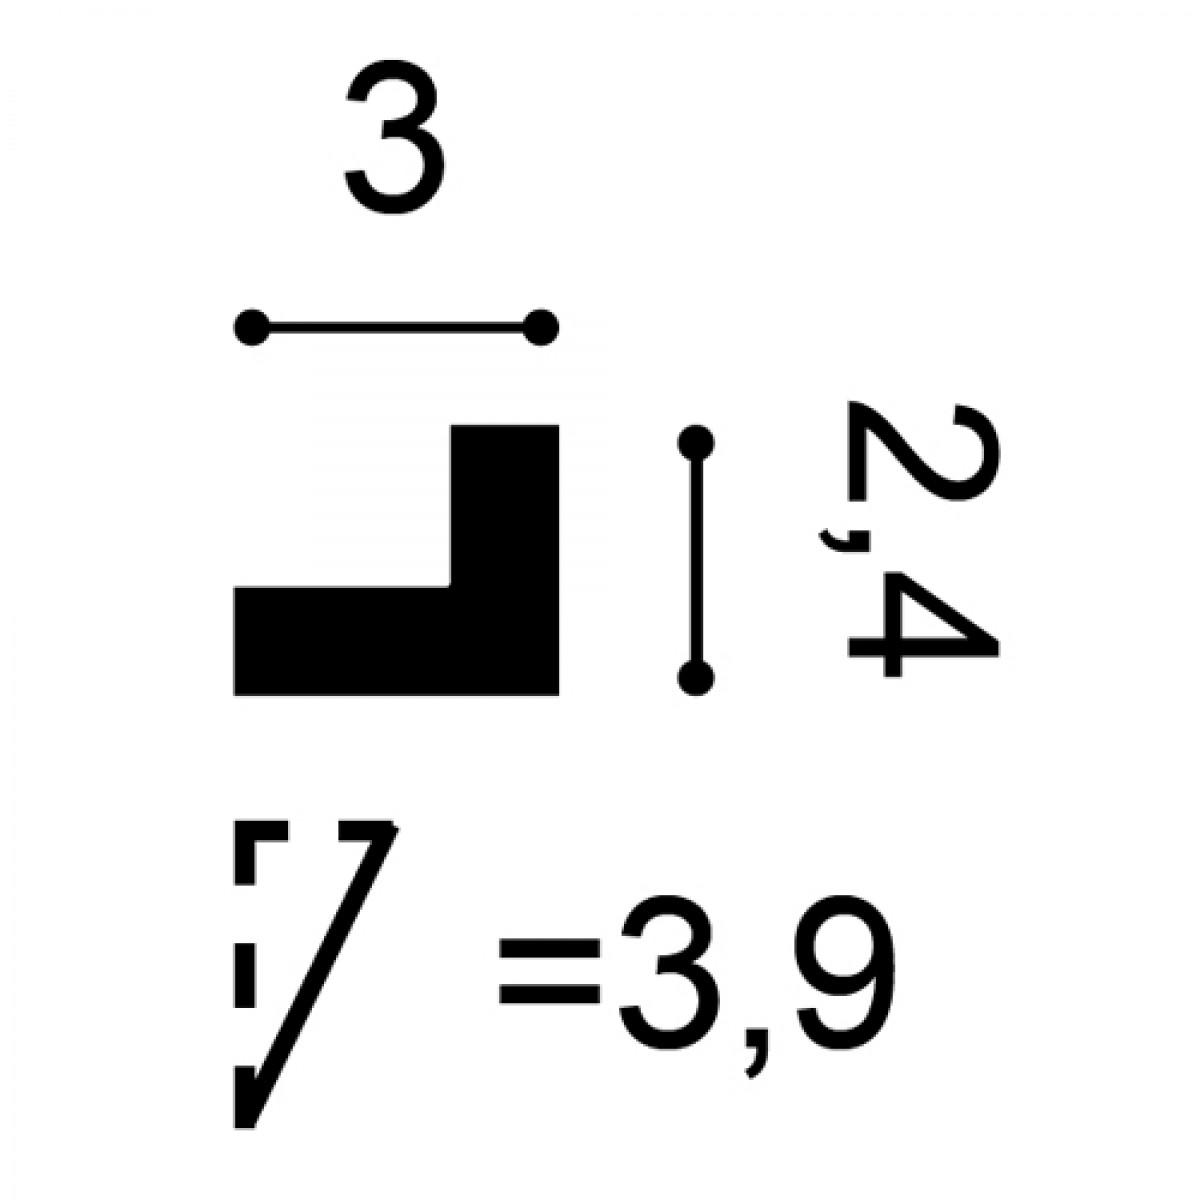 Brau Axxent PX164, Dimensiuni: 200 X 2.4 X 3 cm, Orac Decor